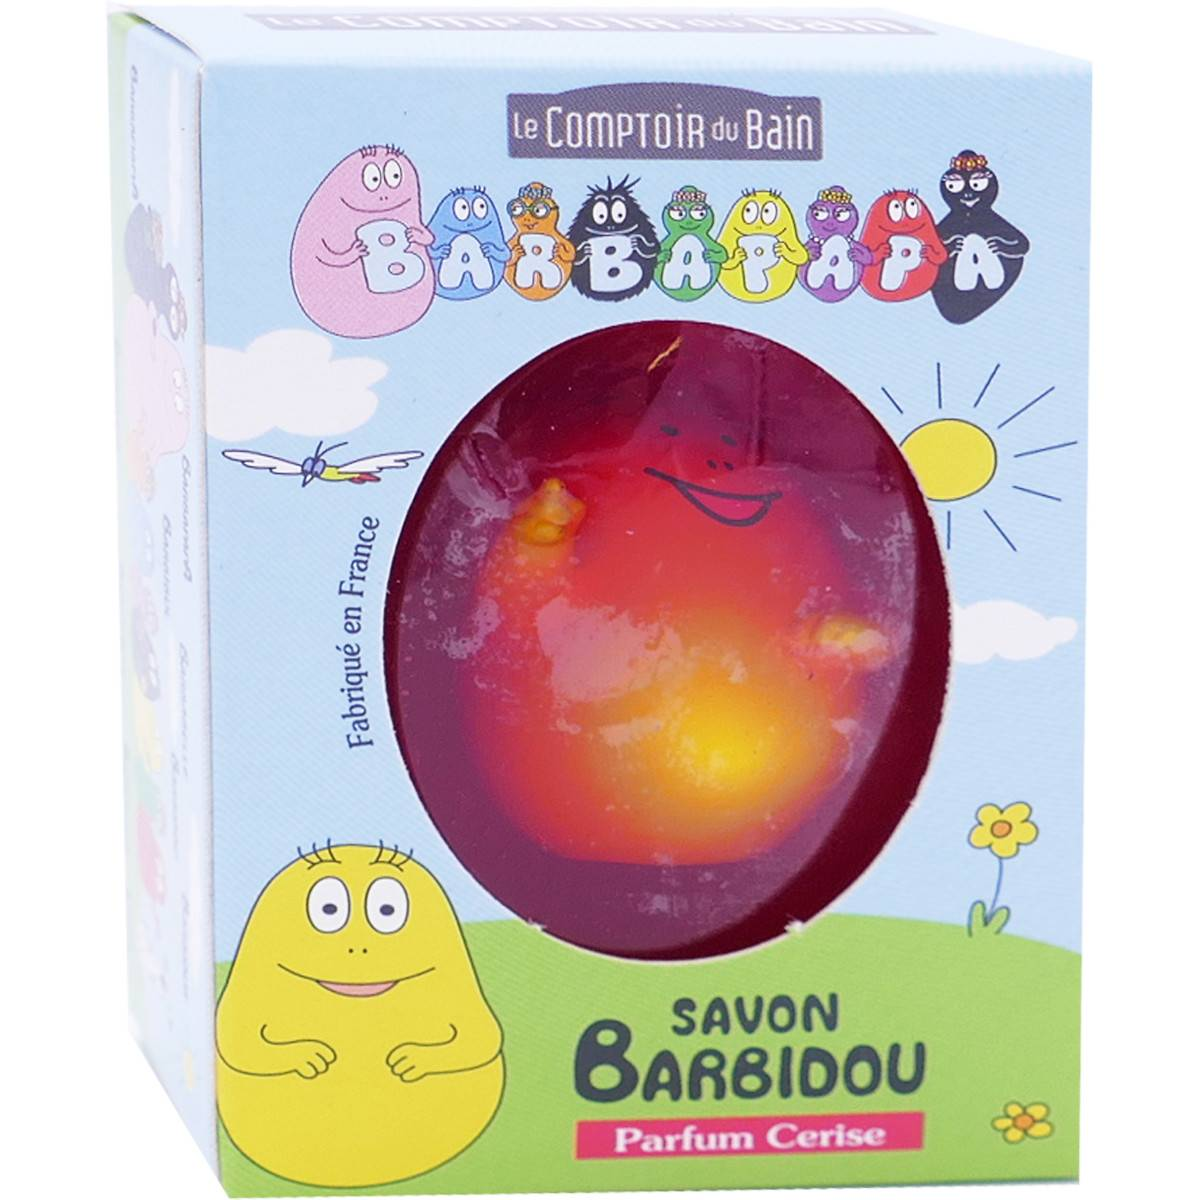 LE COMPTOIR DU BAIN Barbapapa savon barbidou parfum cerise 84g + figurine